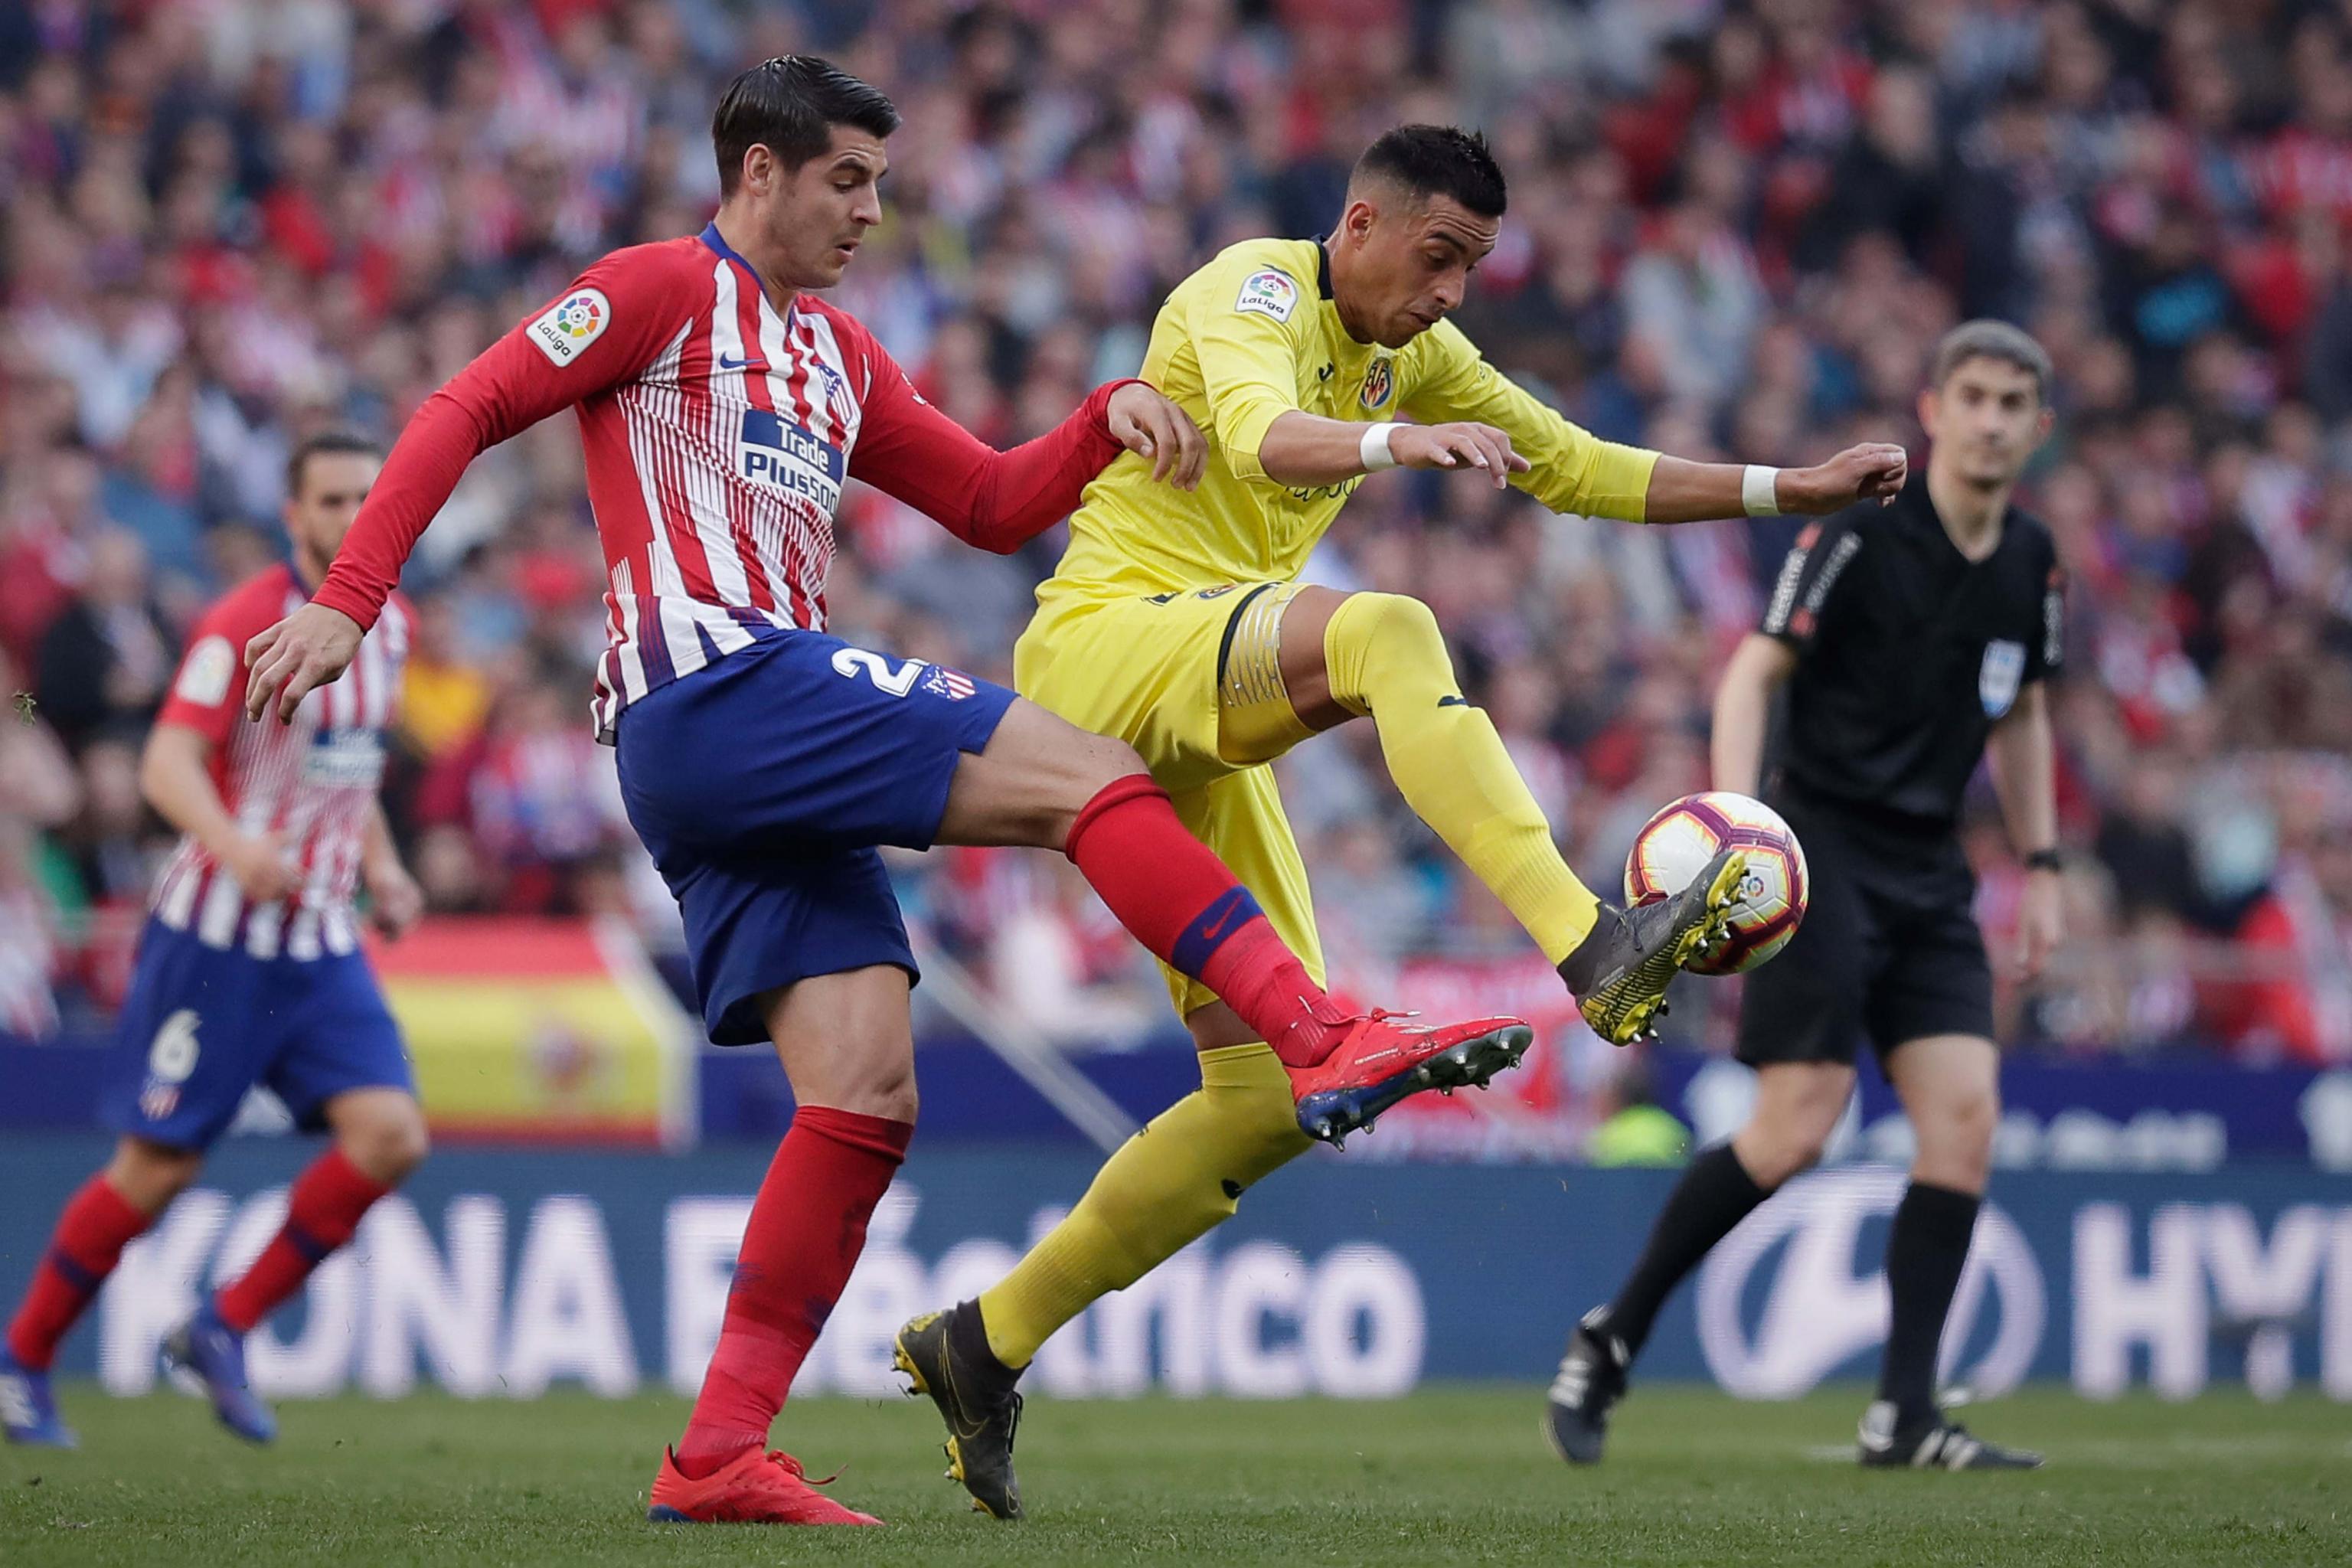 Judge Denies La Liga S Request To Play Villarreal Vs Atletico Madrid In Miami Bleacher Report Latest News Videos And Highlights